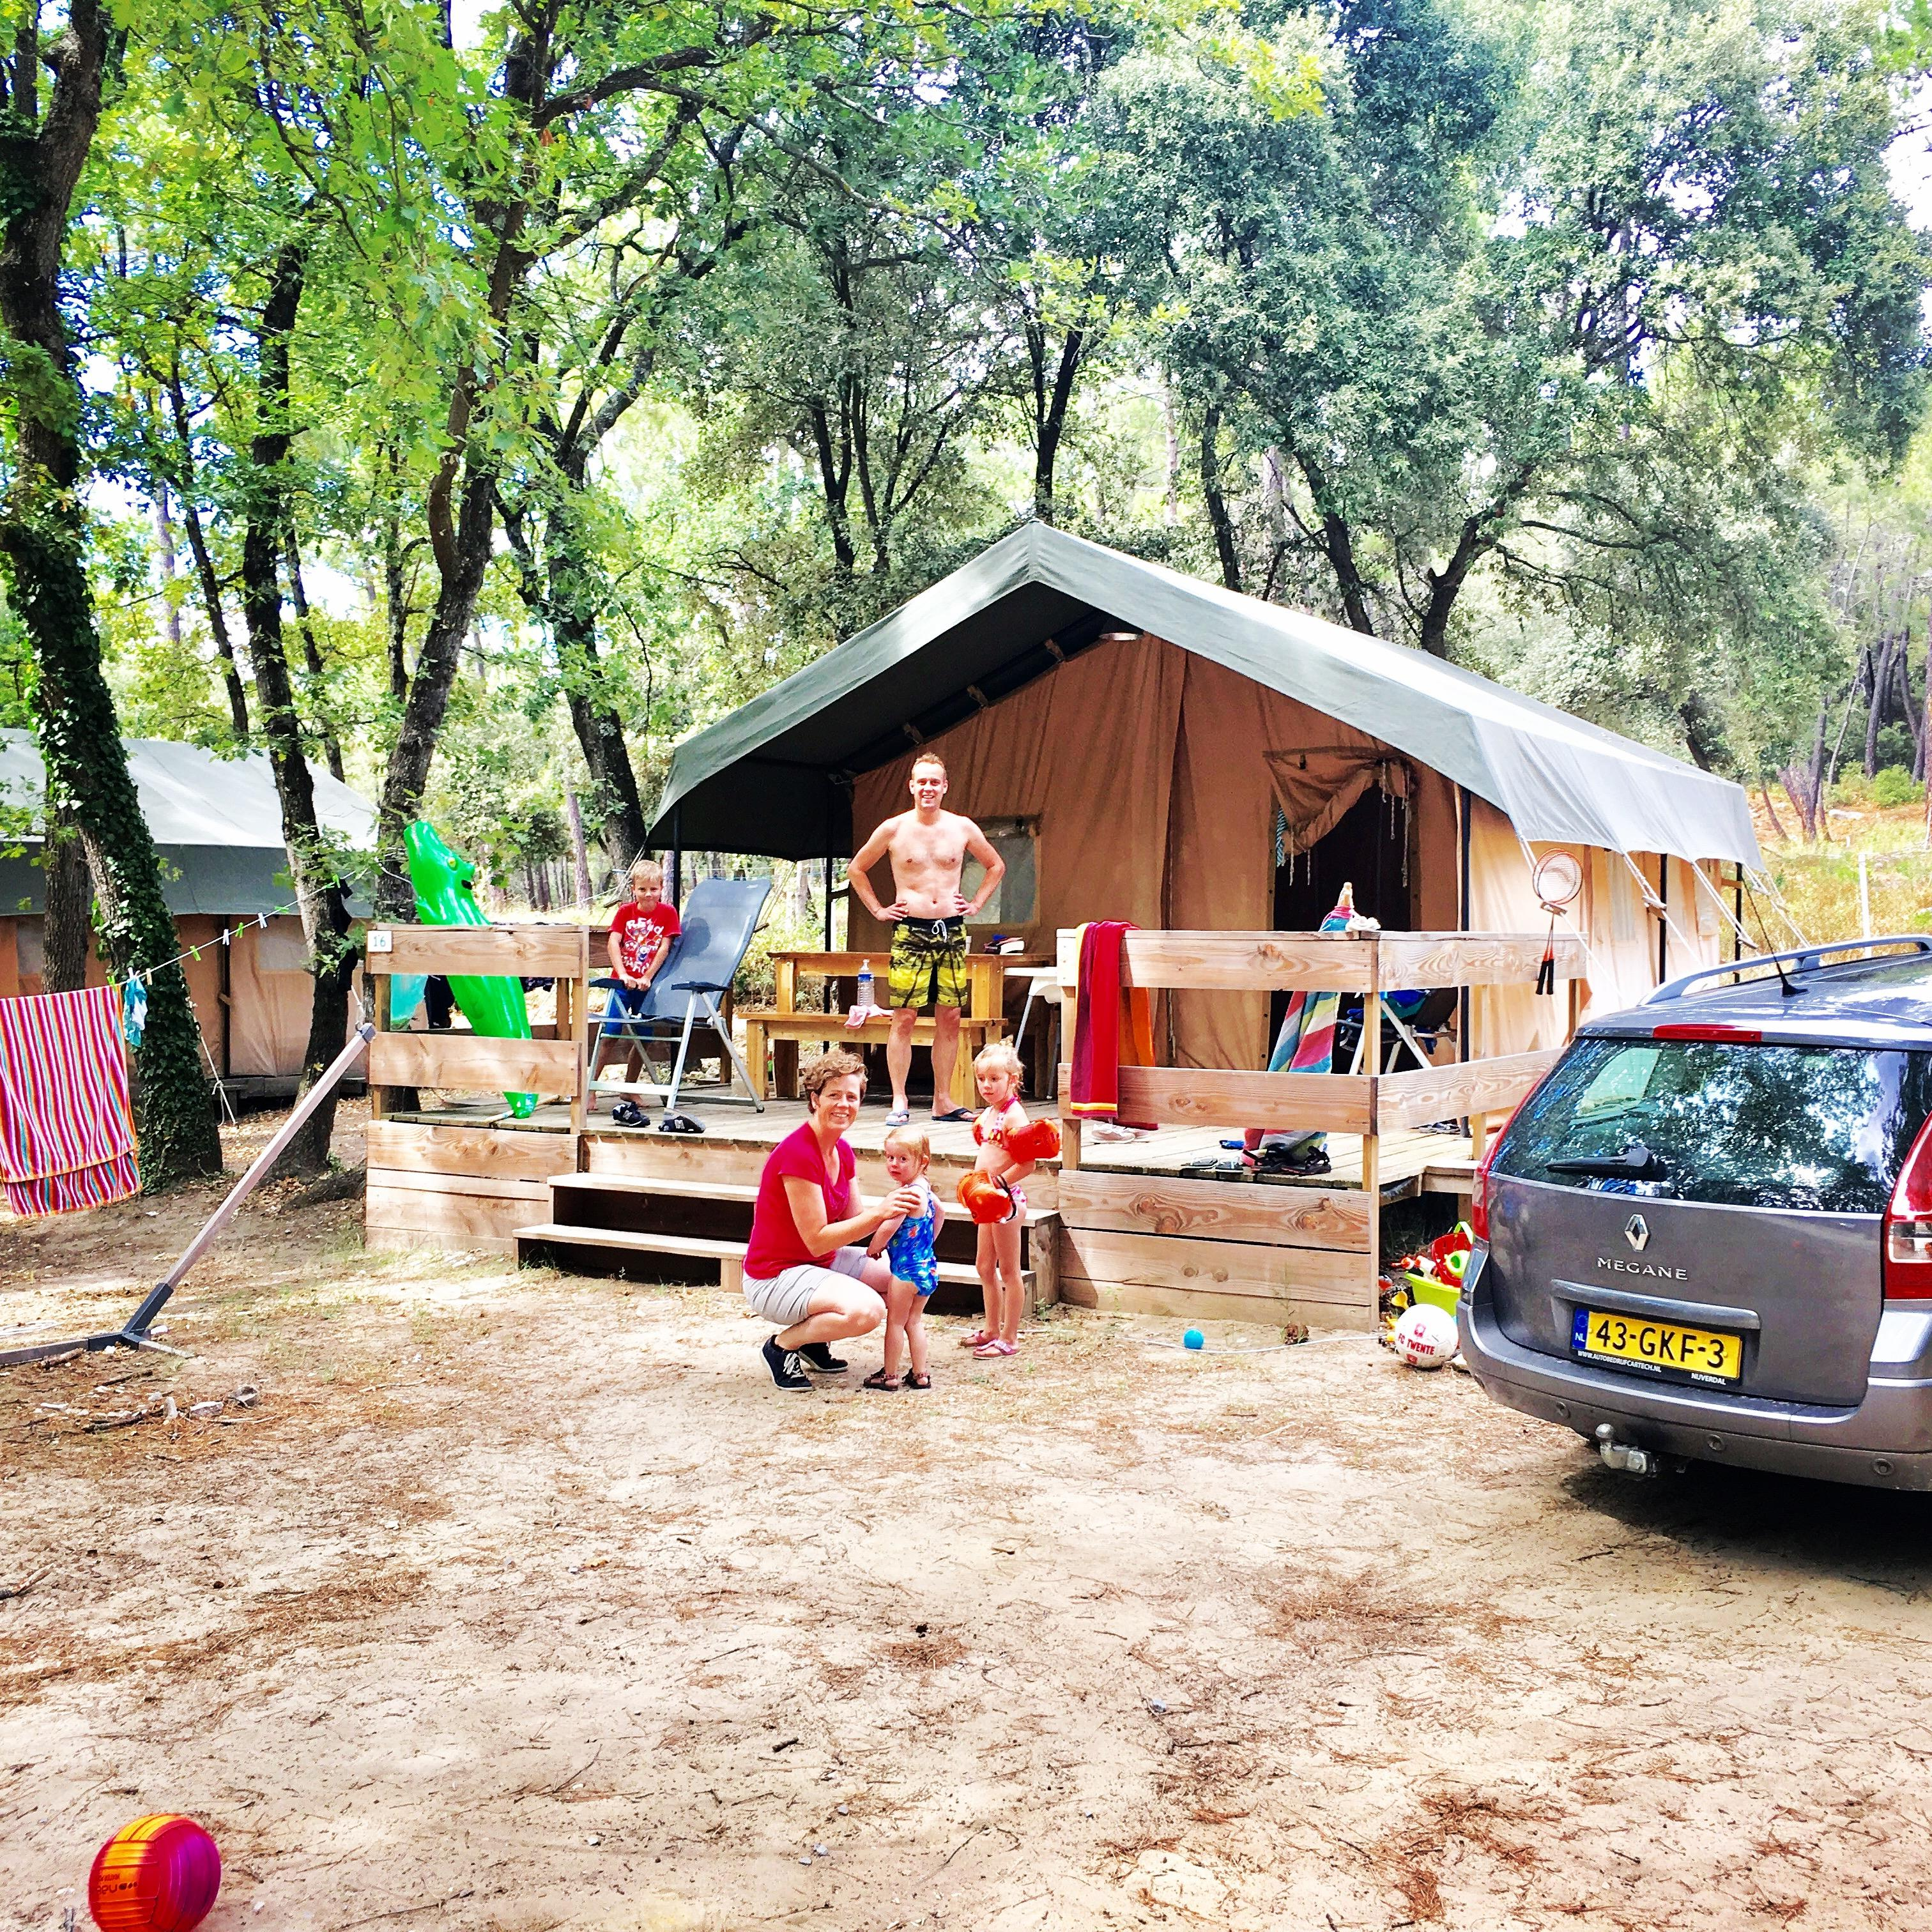 Location - Safari Lodge L - 2 Chambres (4 Adultes Maximum Et 1 Enfant) - Camping La Simioune